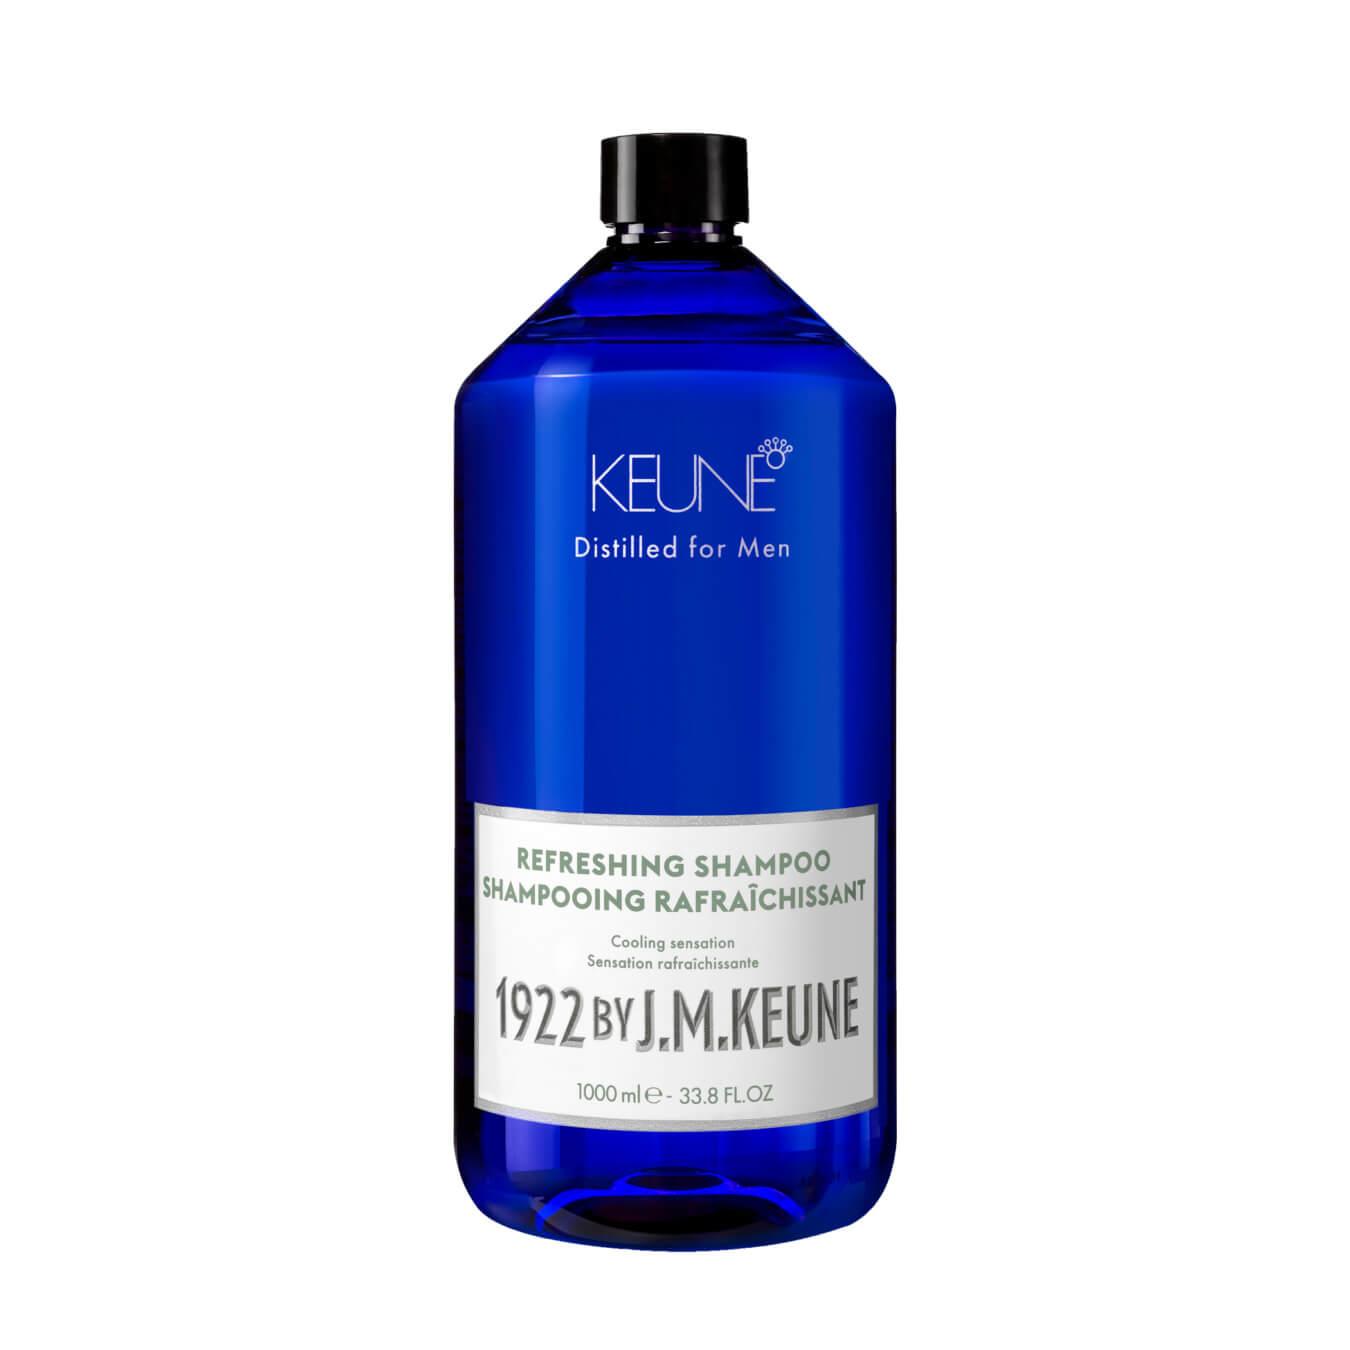 Koop 1922 By JM Keune Refreshing Shampoo 1000ml